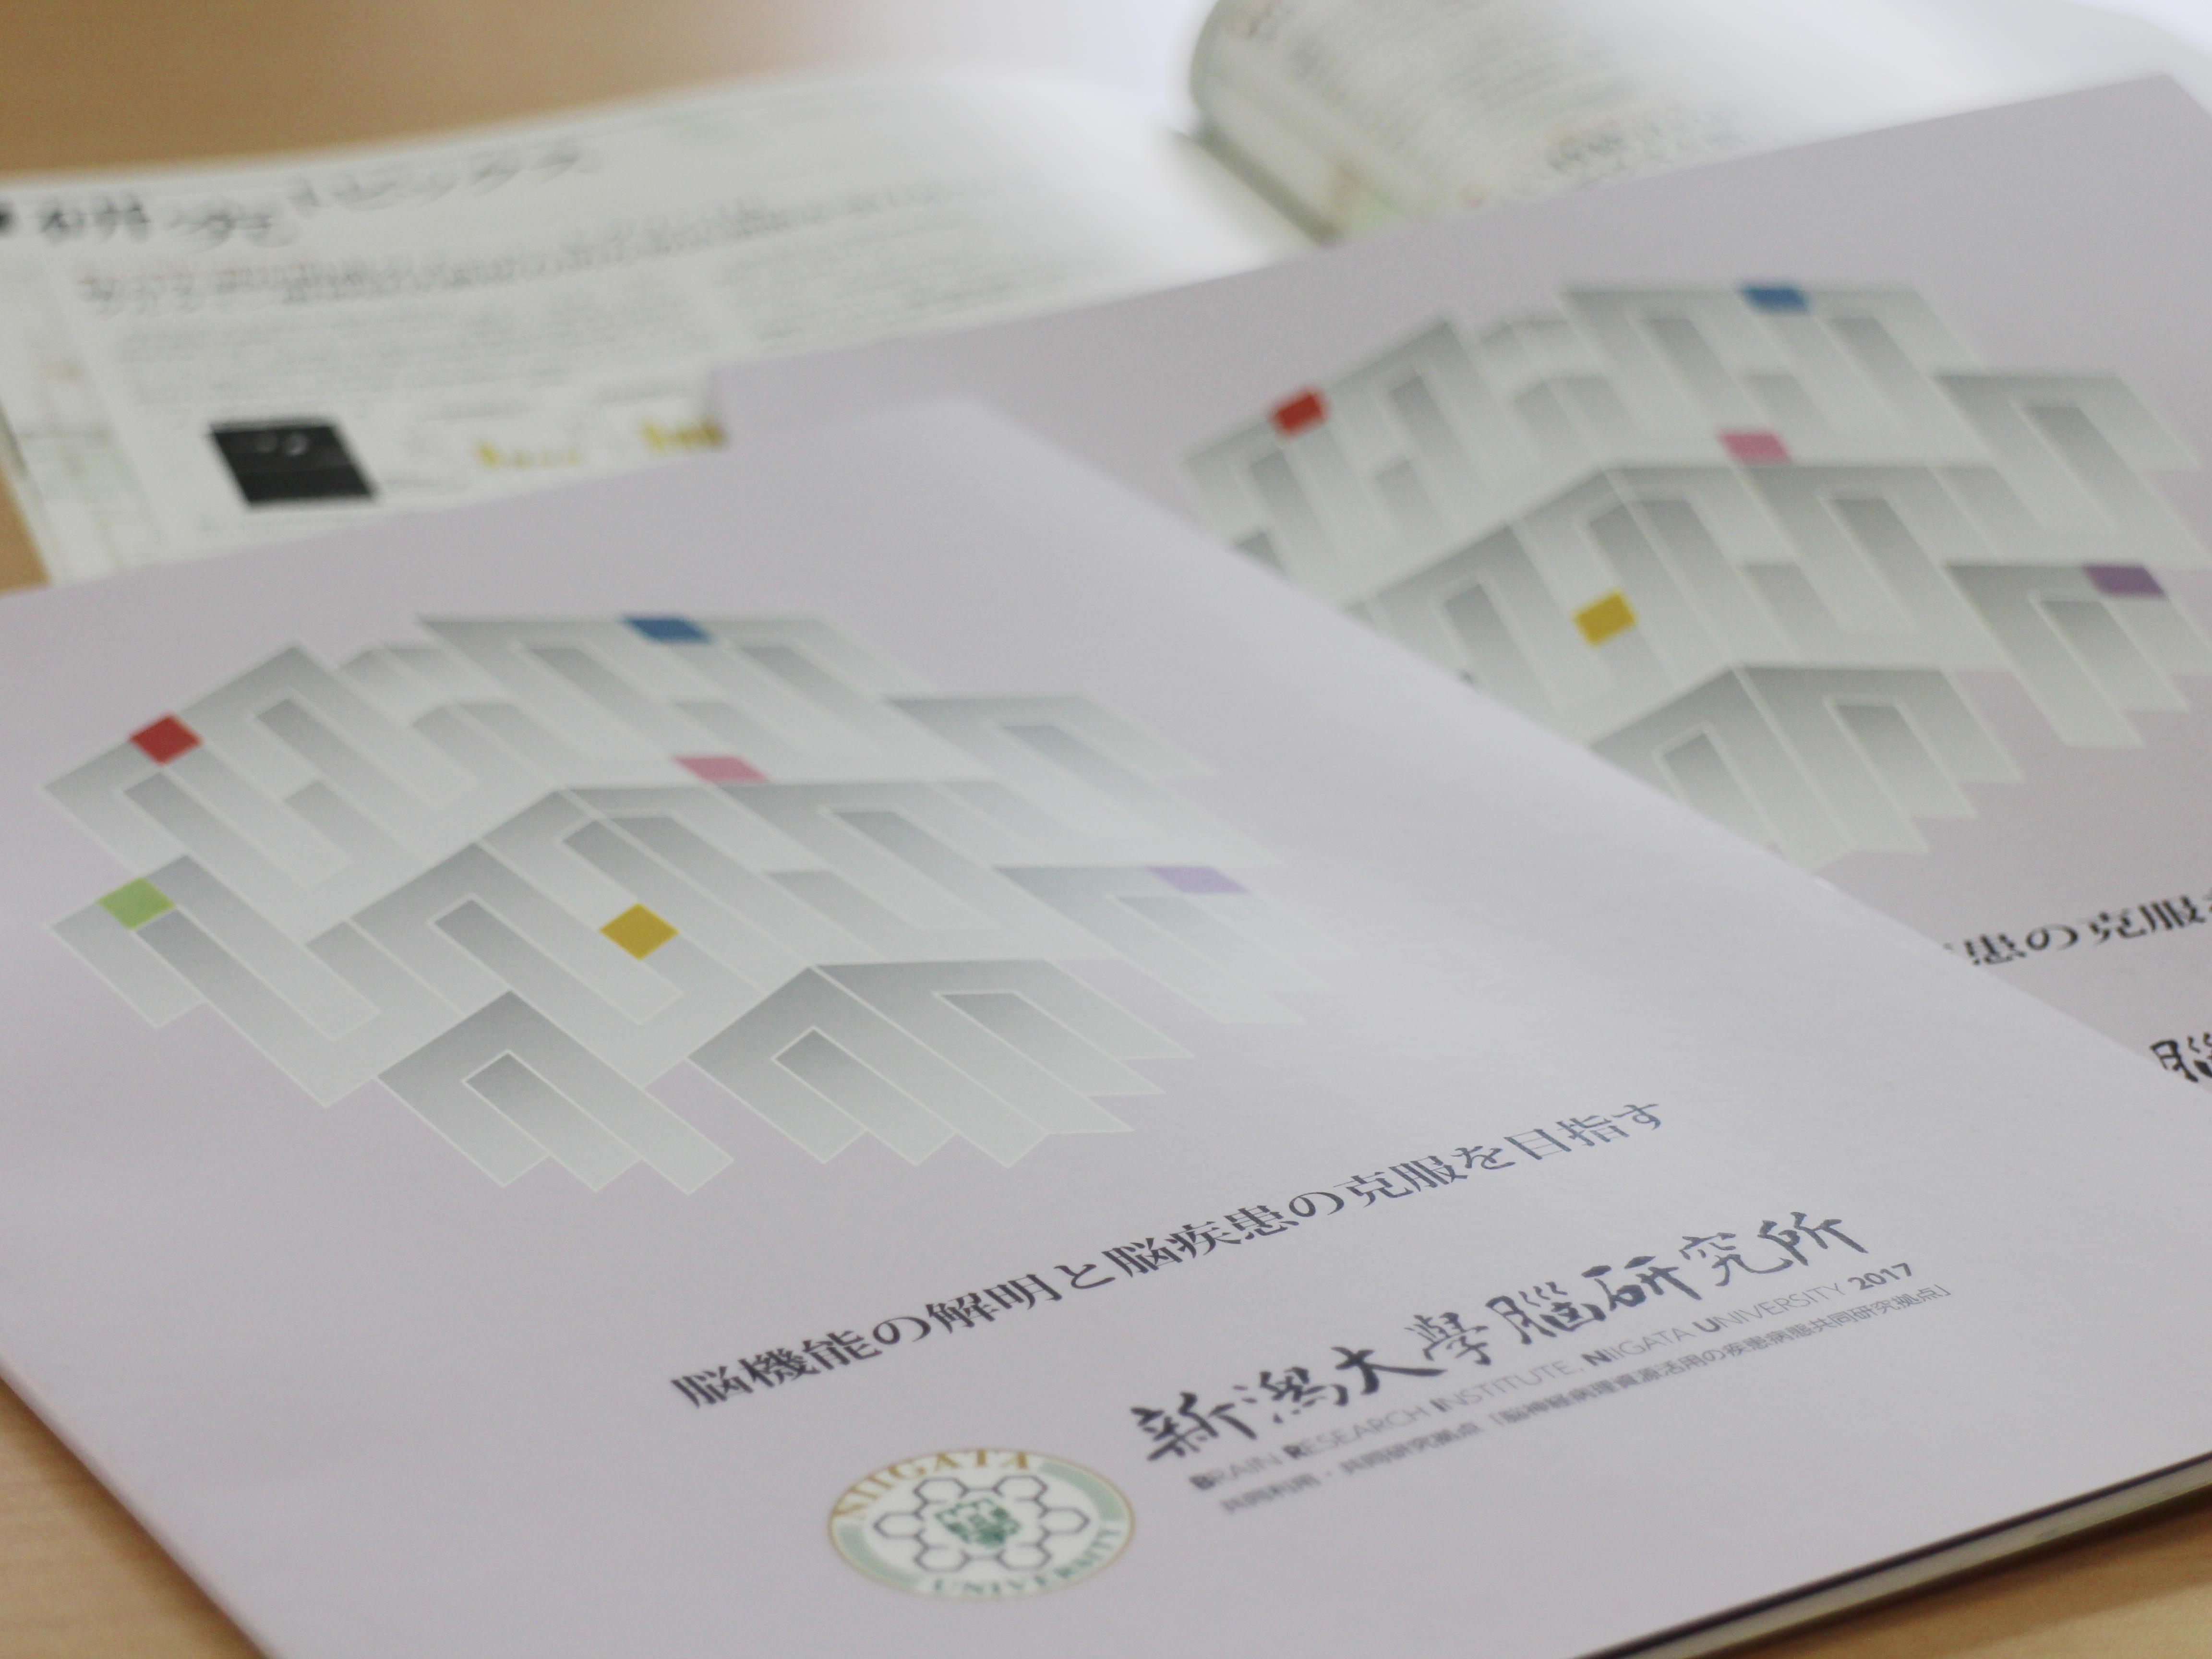 BRI Brochure 2017 published